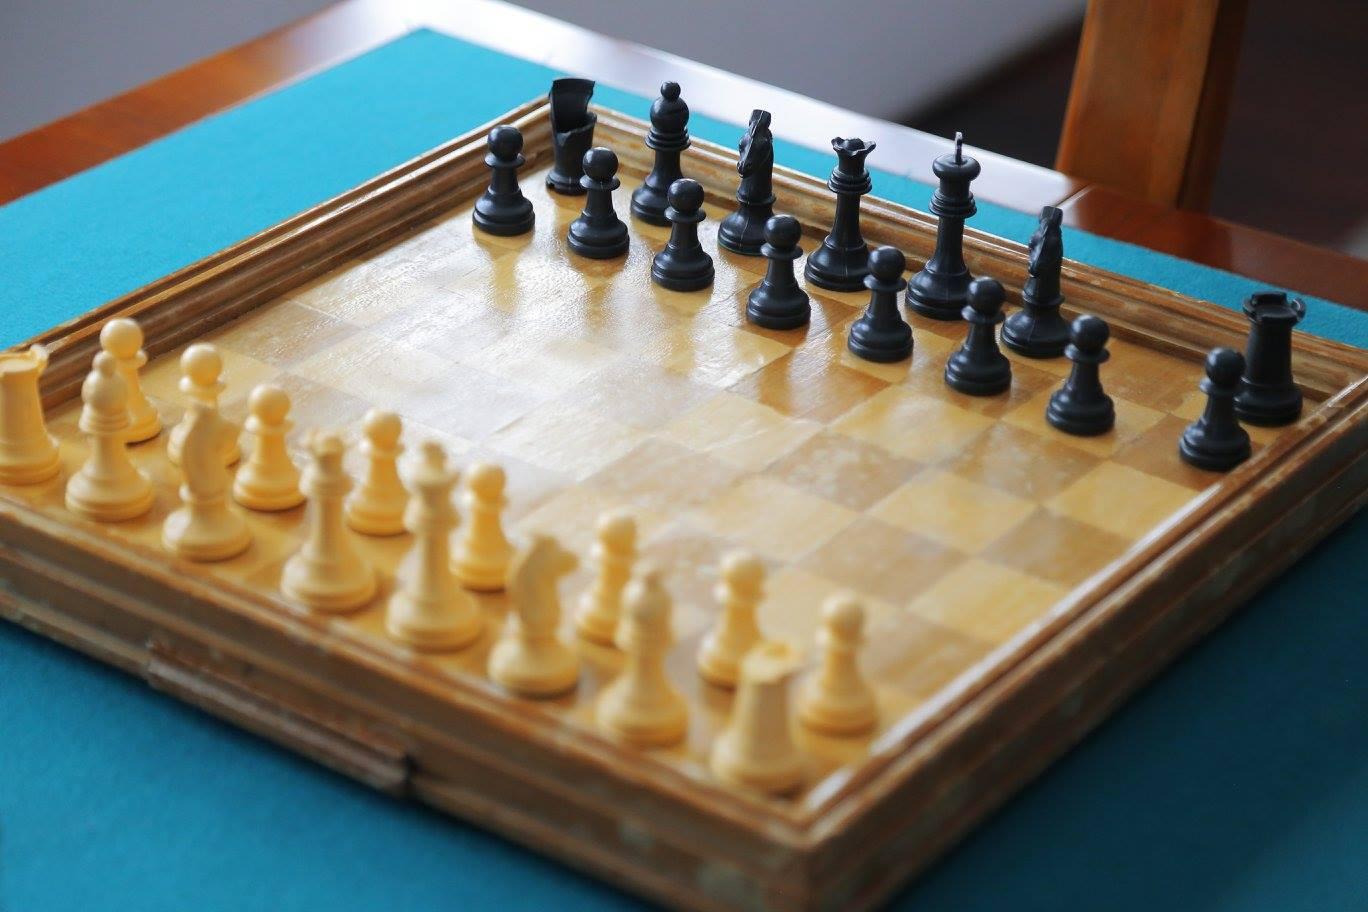 geres alugar quinta taide xadrez